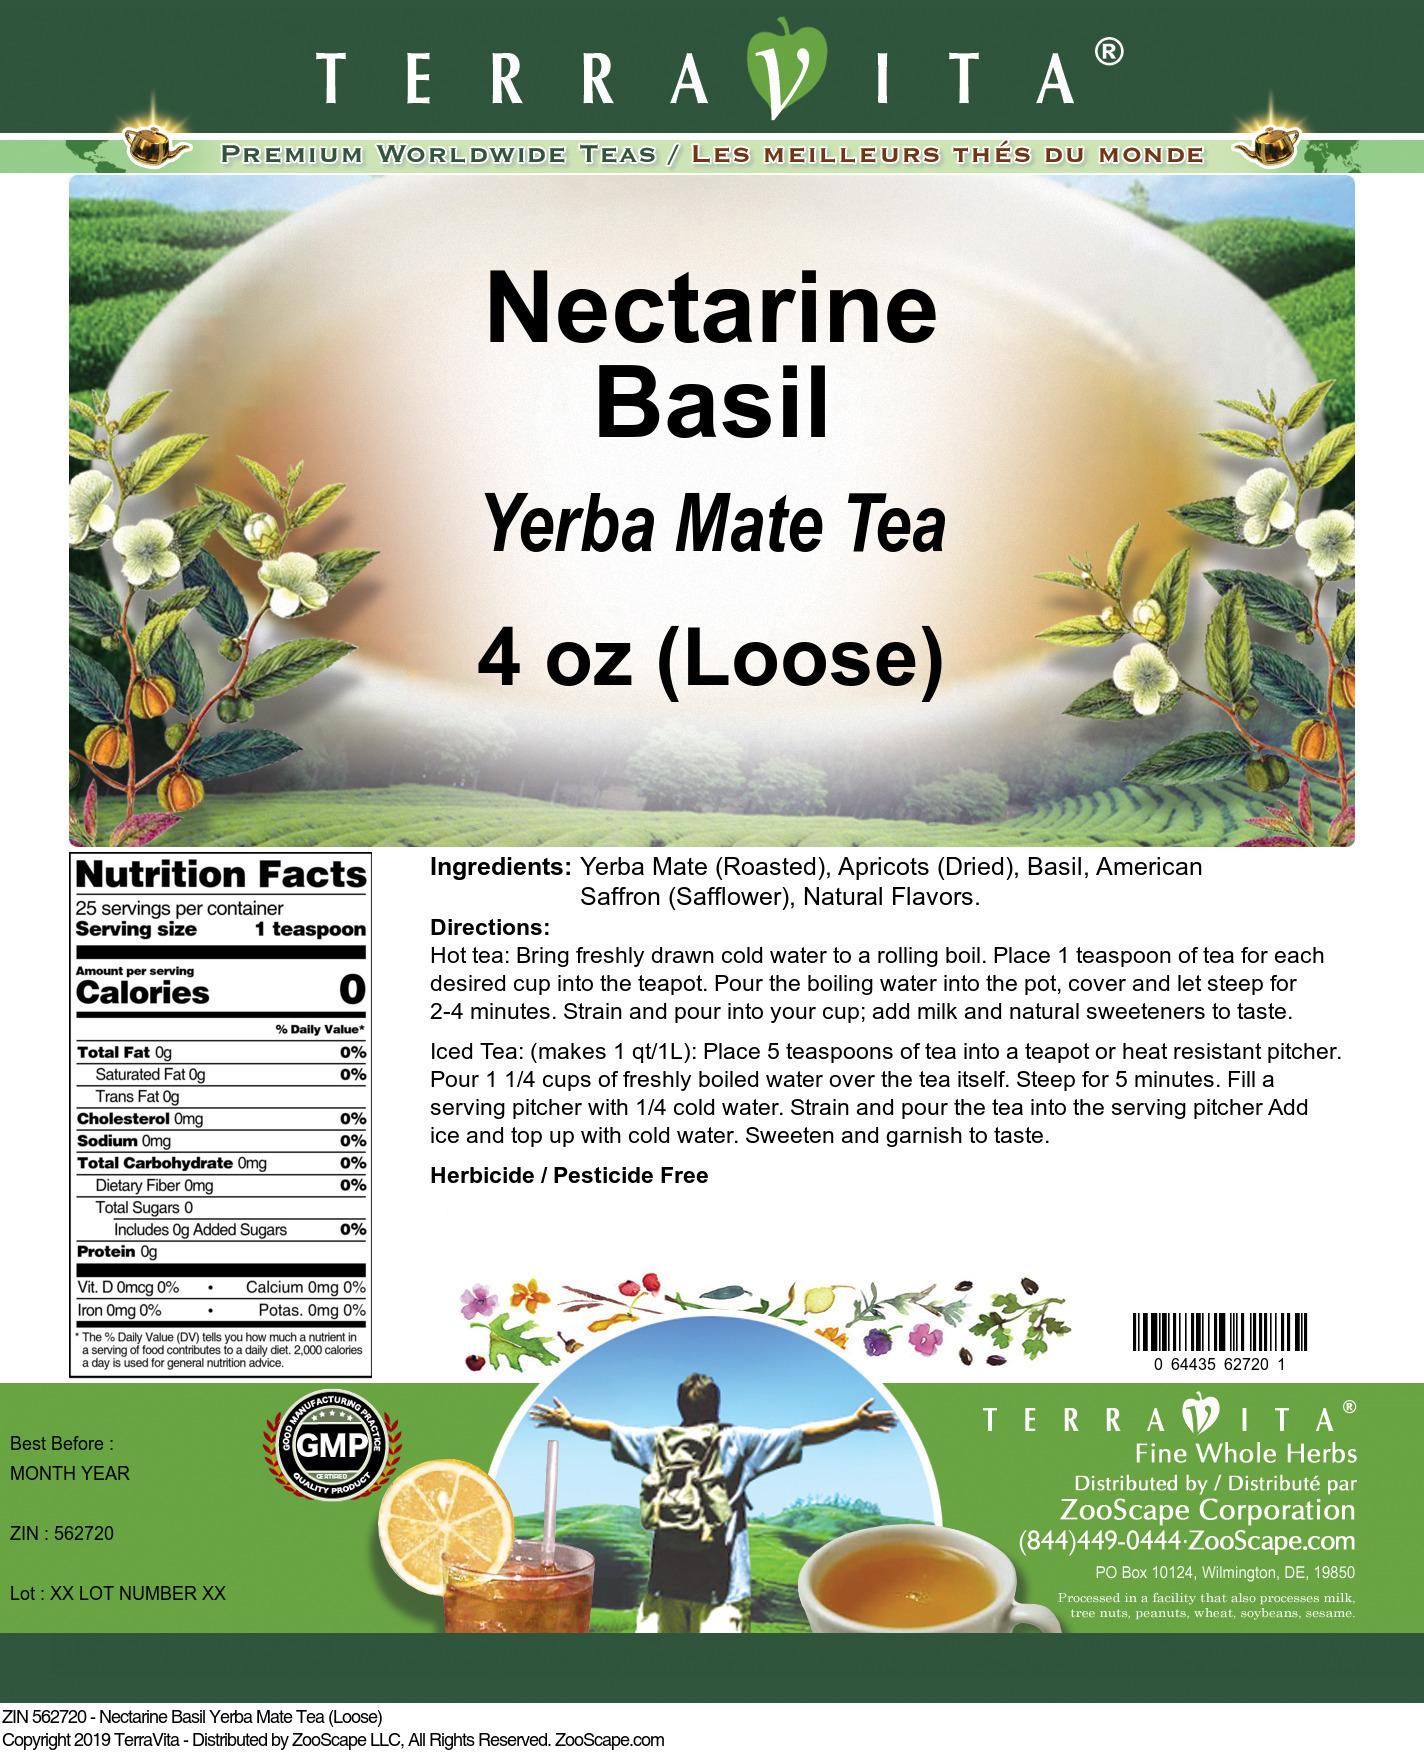 Nectarine Basil Yerba Mate Tea (Loose)